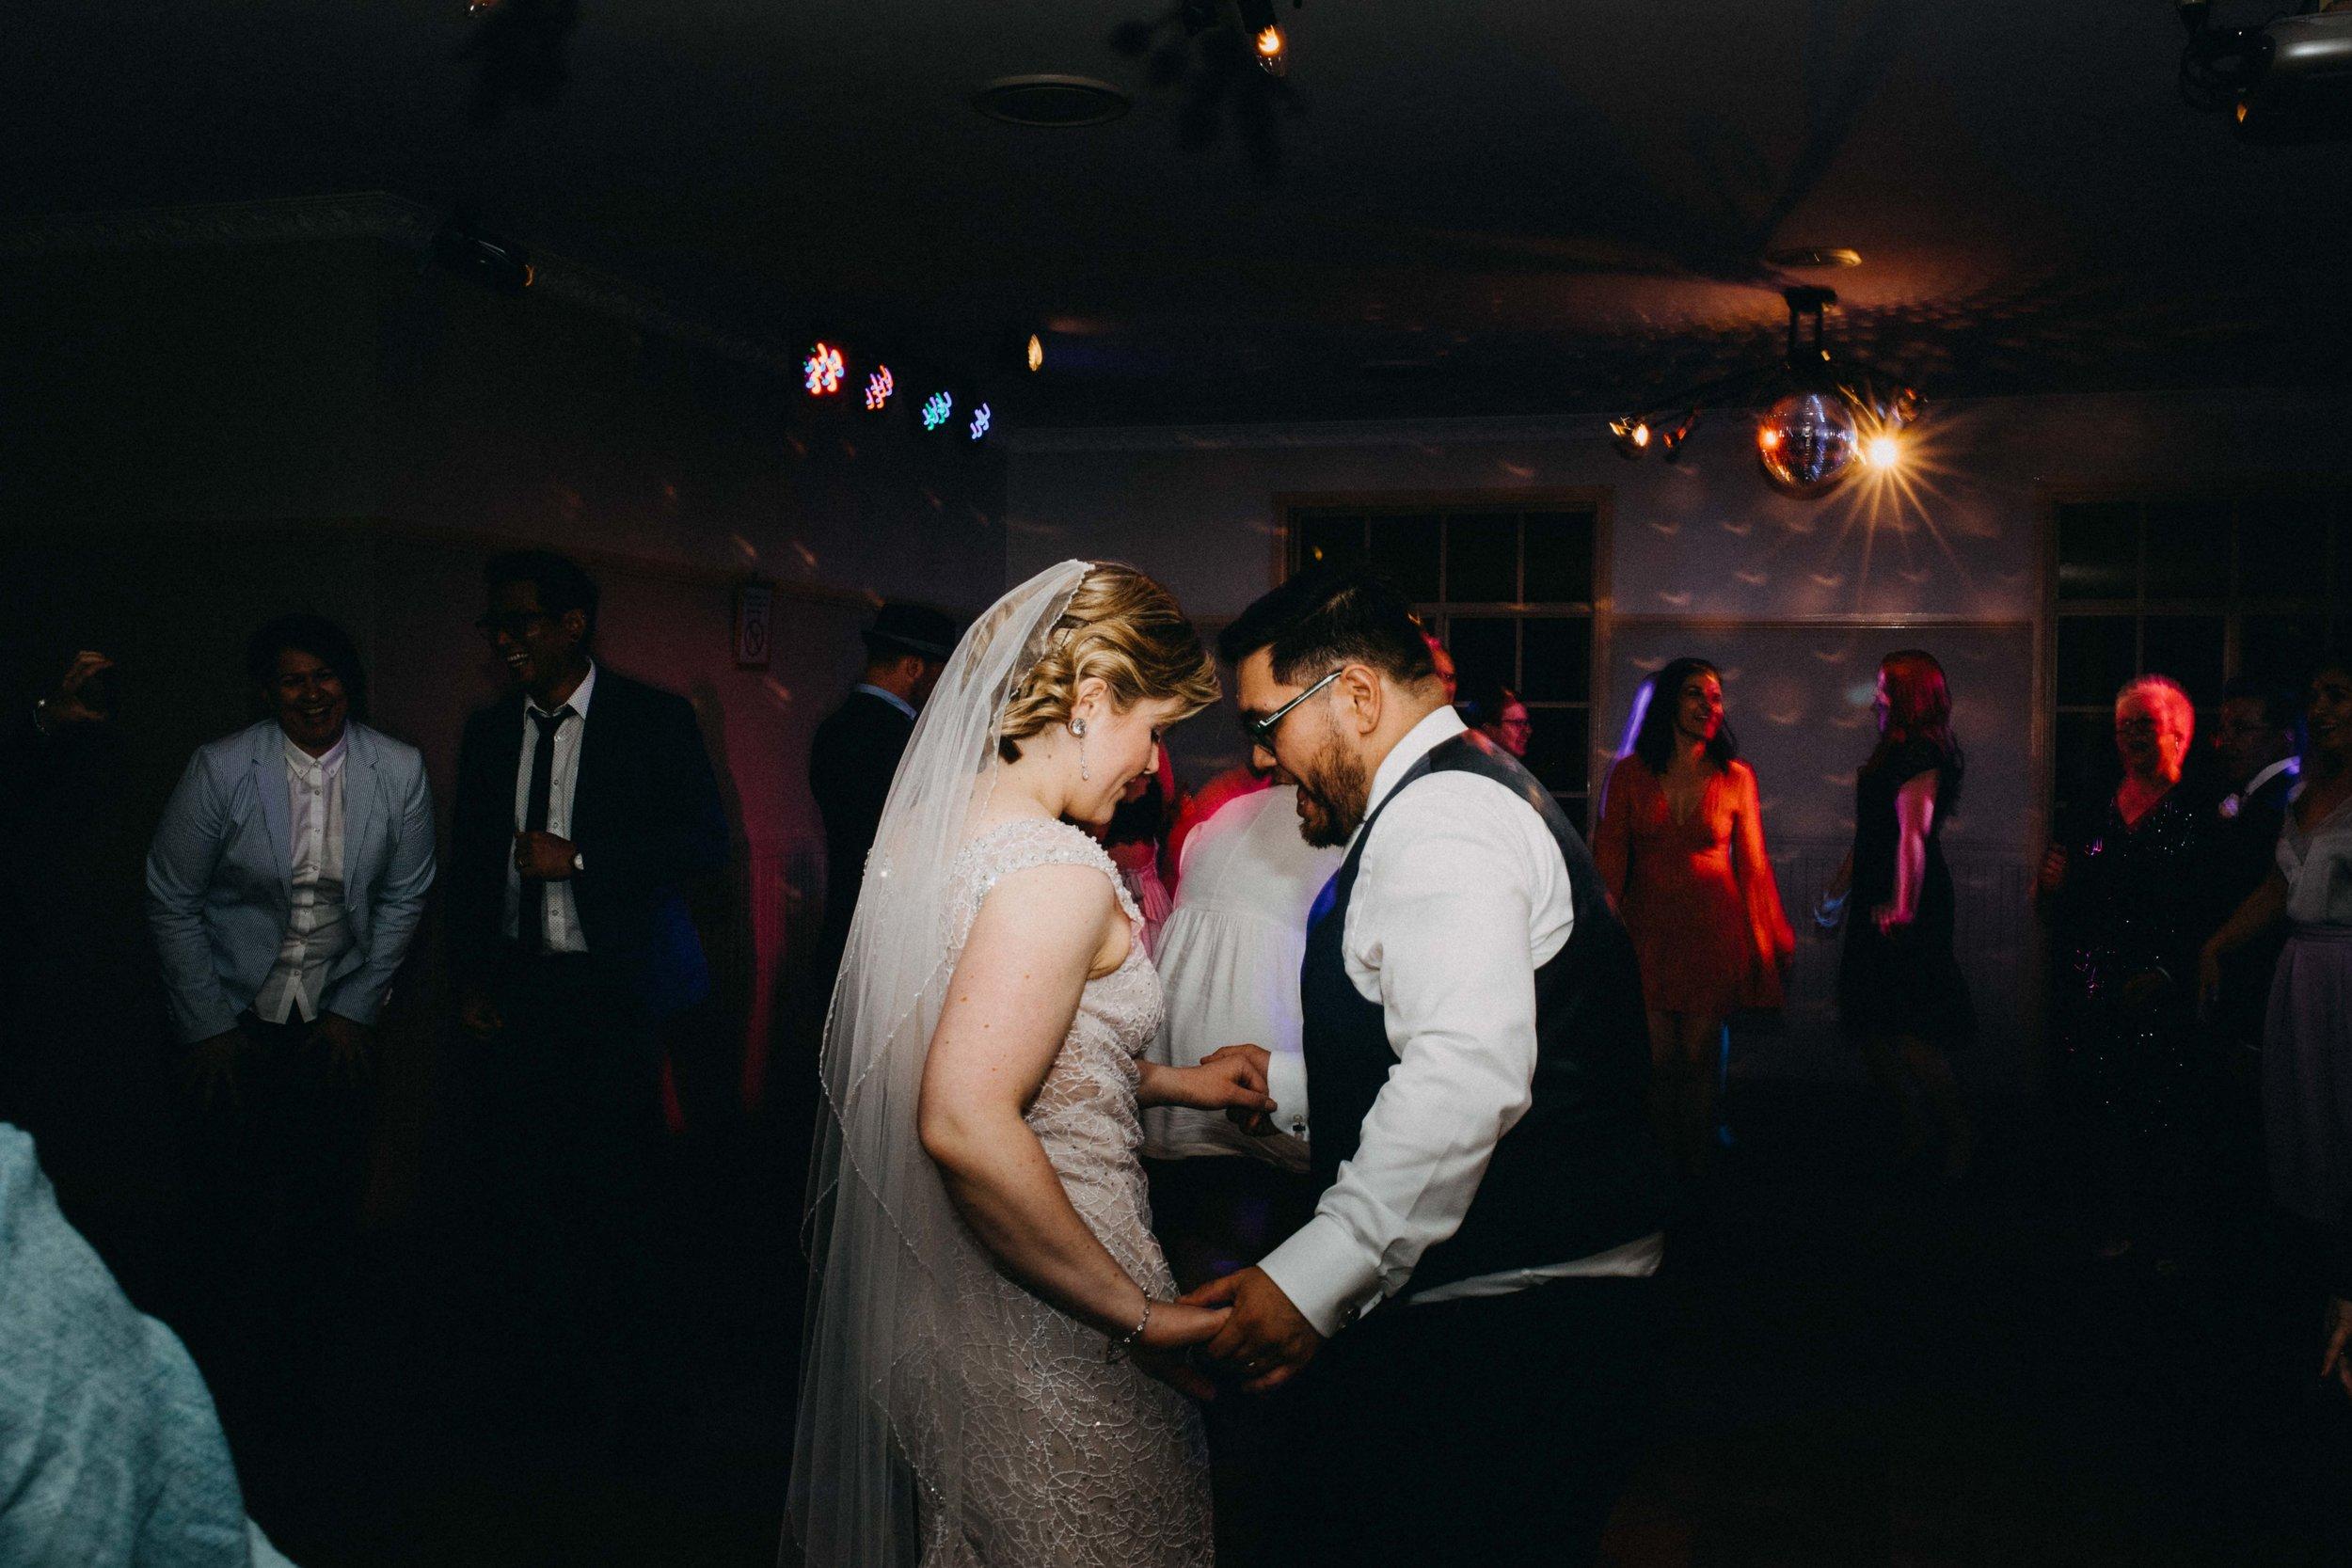 appin-house-wedding-macarthur-www.emilyobrienphotography.net-190.jpg